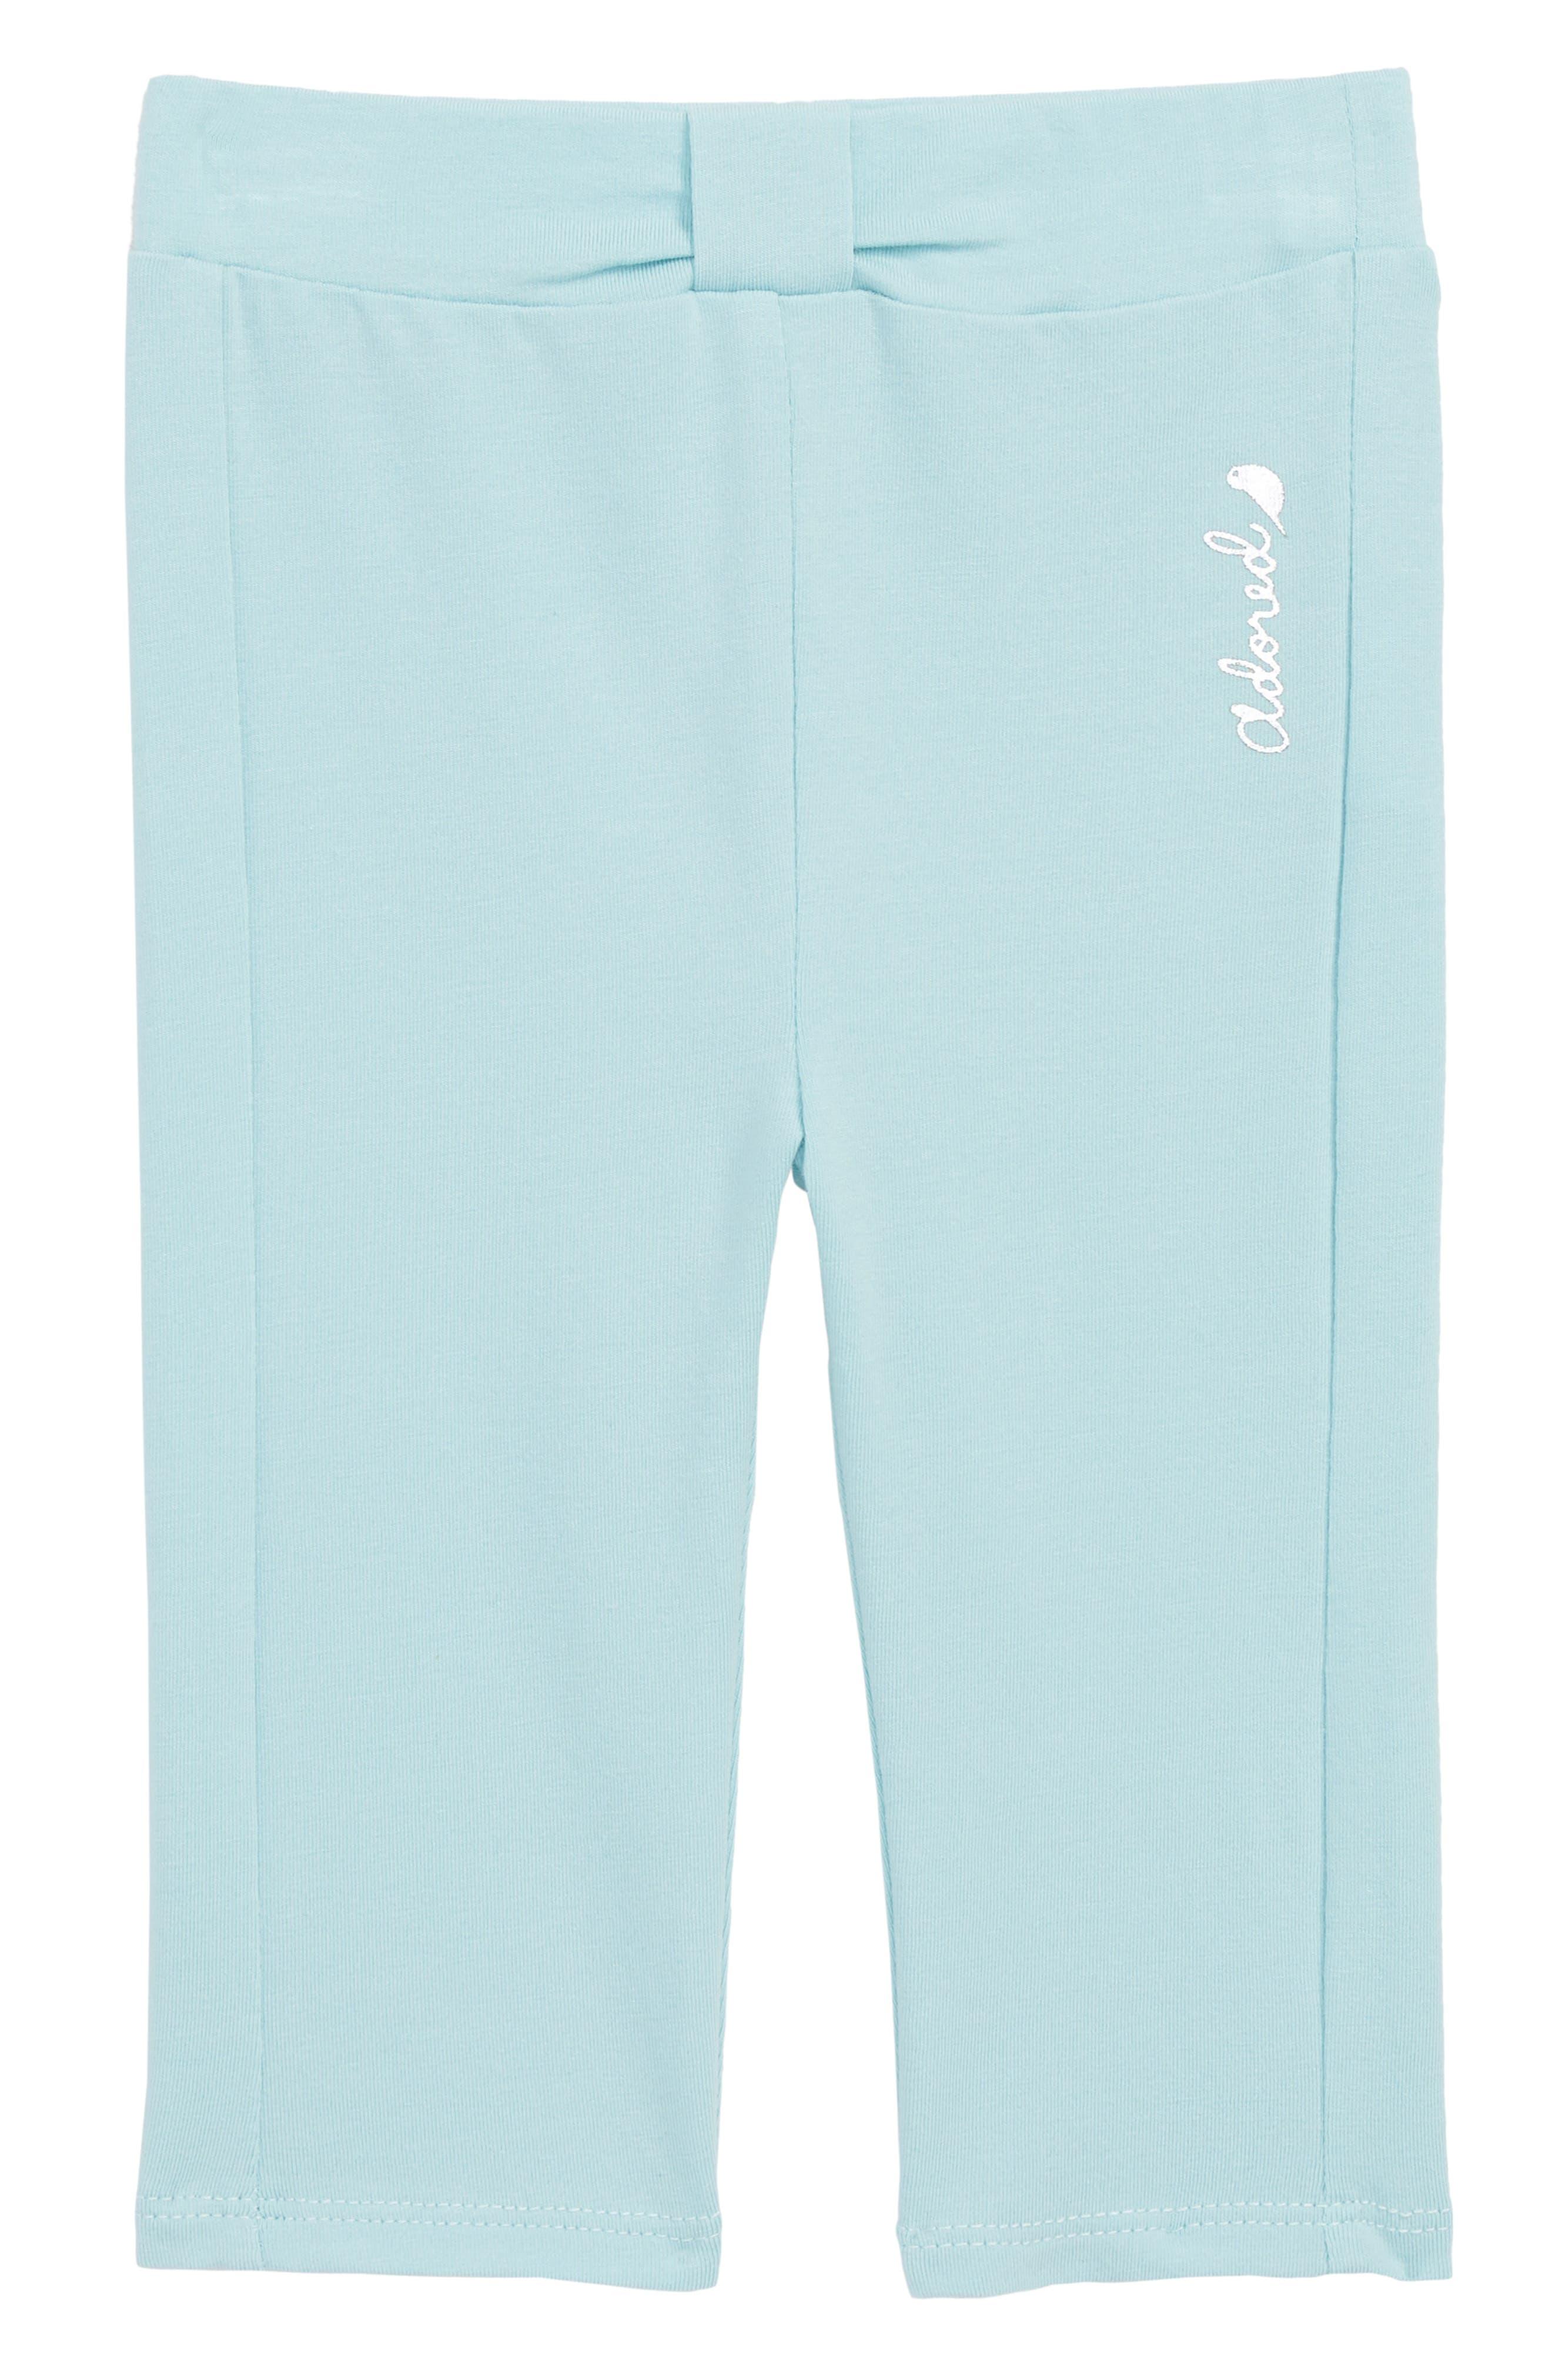 Leggings,                         Main,                         color, Turquoise